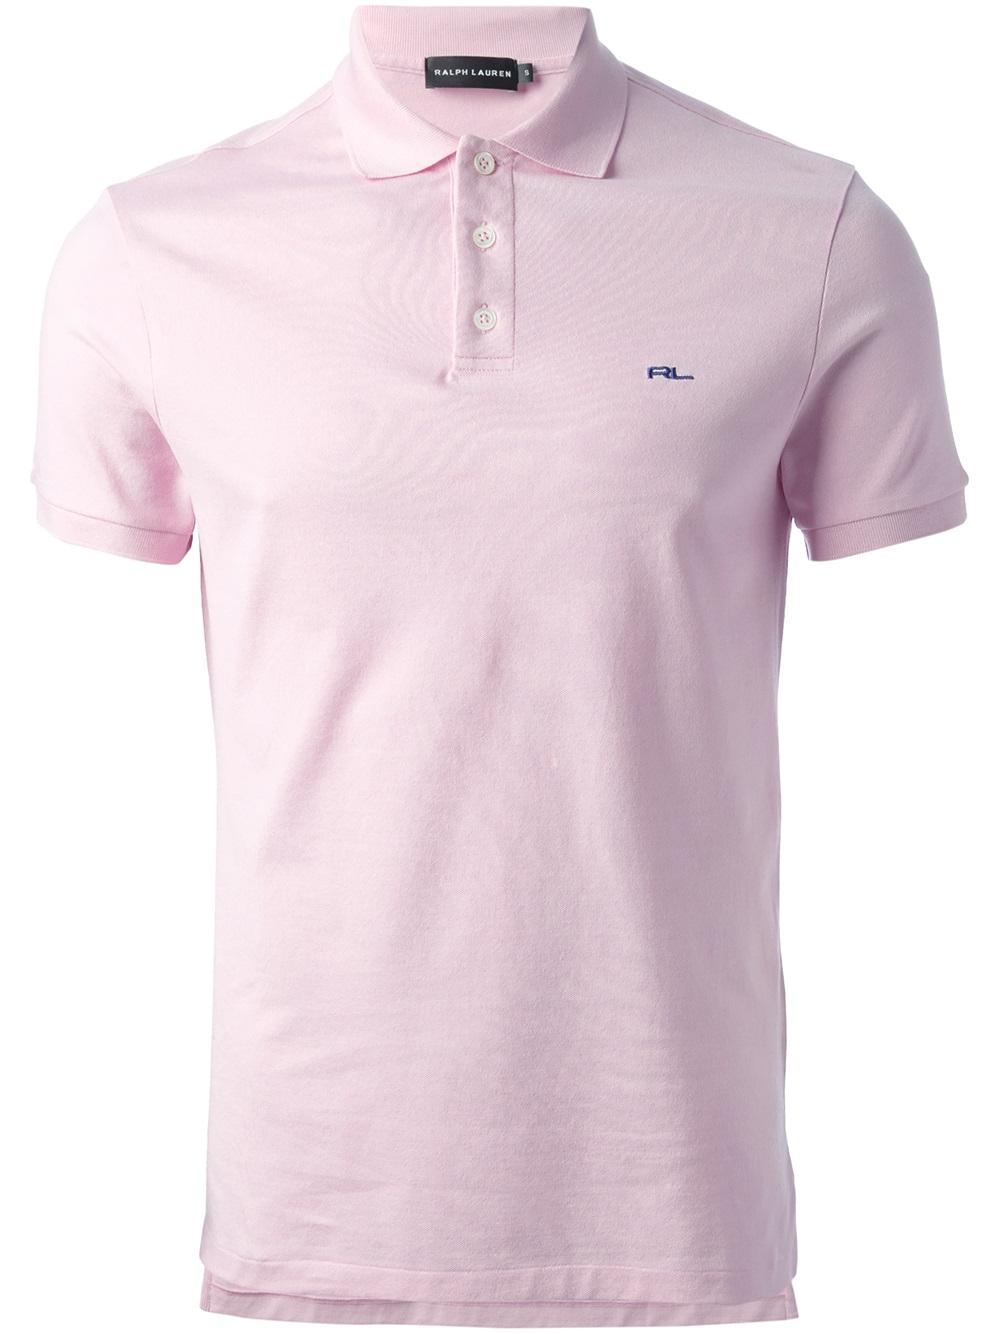 Ralph lauren black label logo polo shirt in pink for men for Ralph lauren black label polo shirt